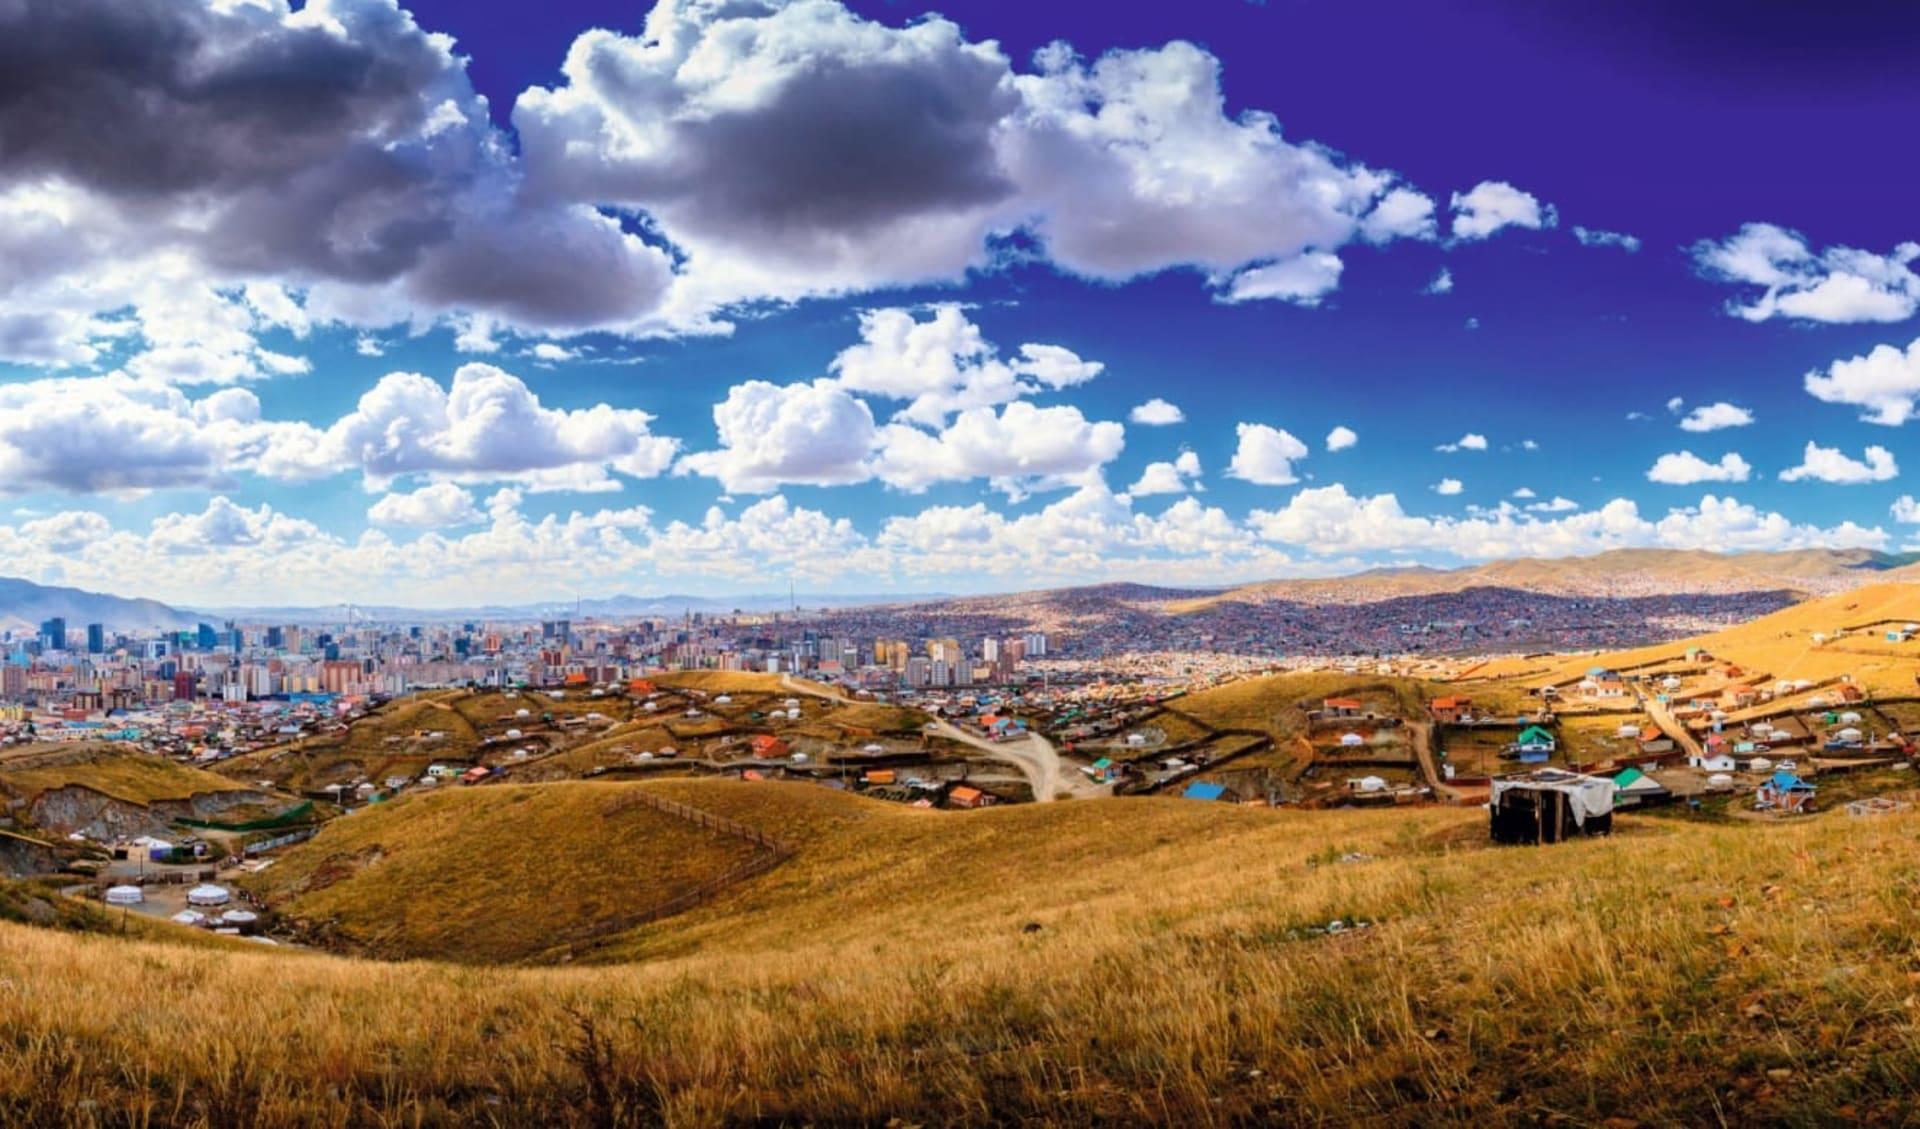 Golden Eagle Moskau-Wladiwostok: MN_Ulan Bator_shutterstock_781445686_Michal Vit